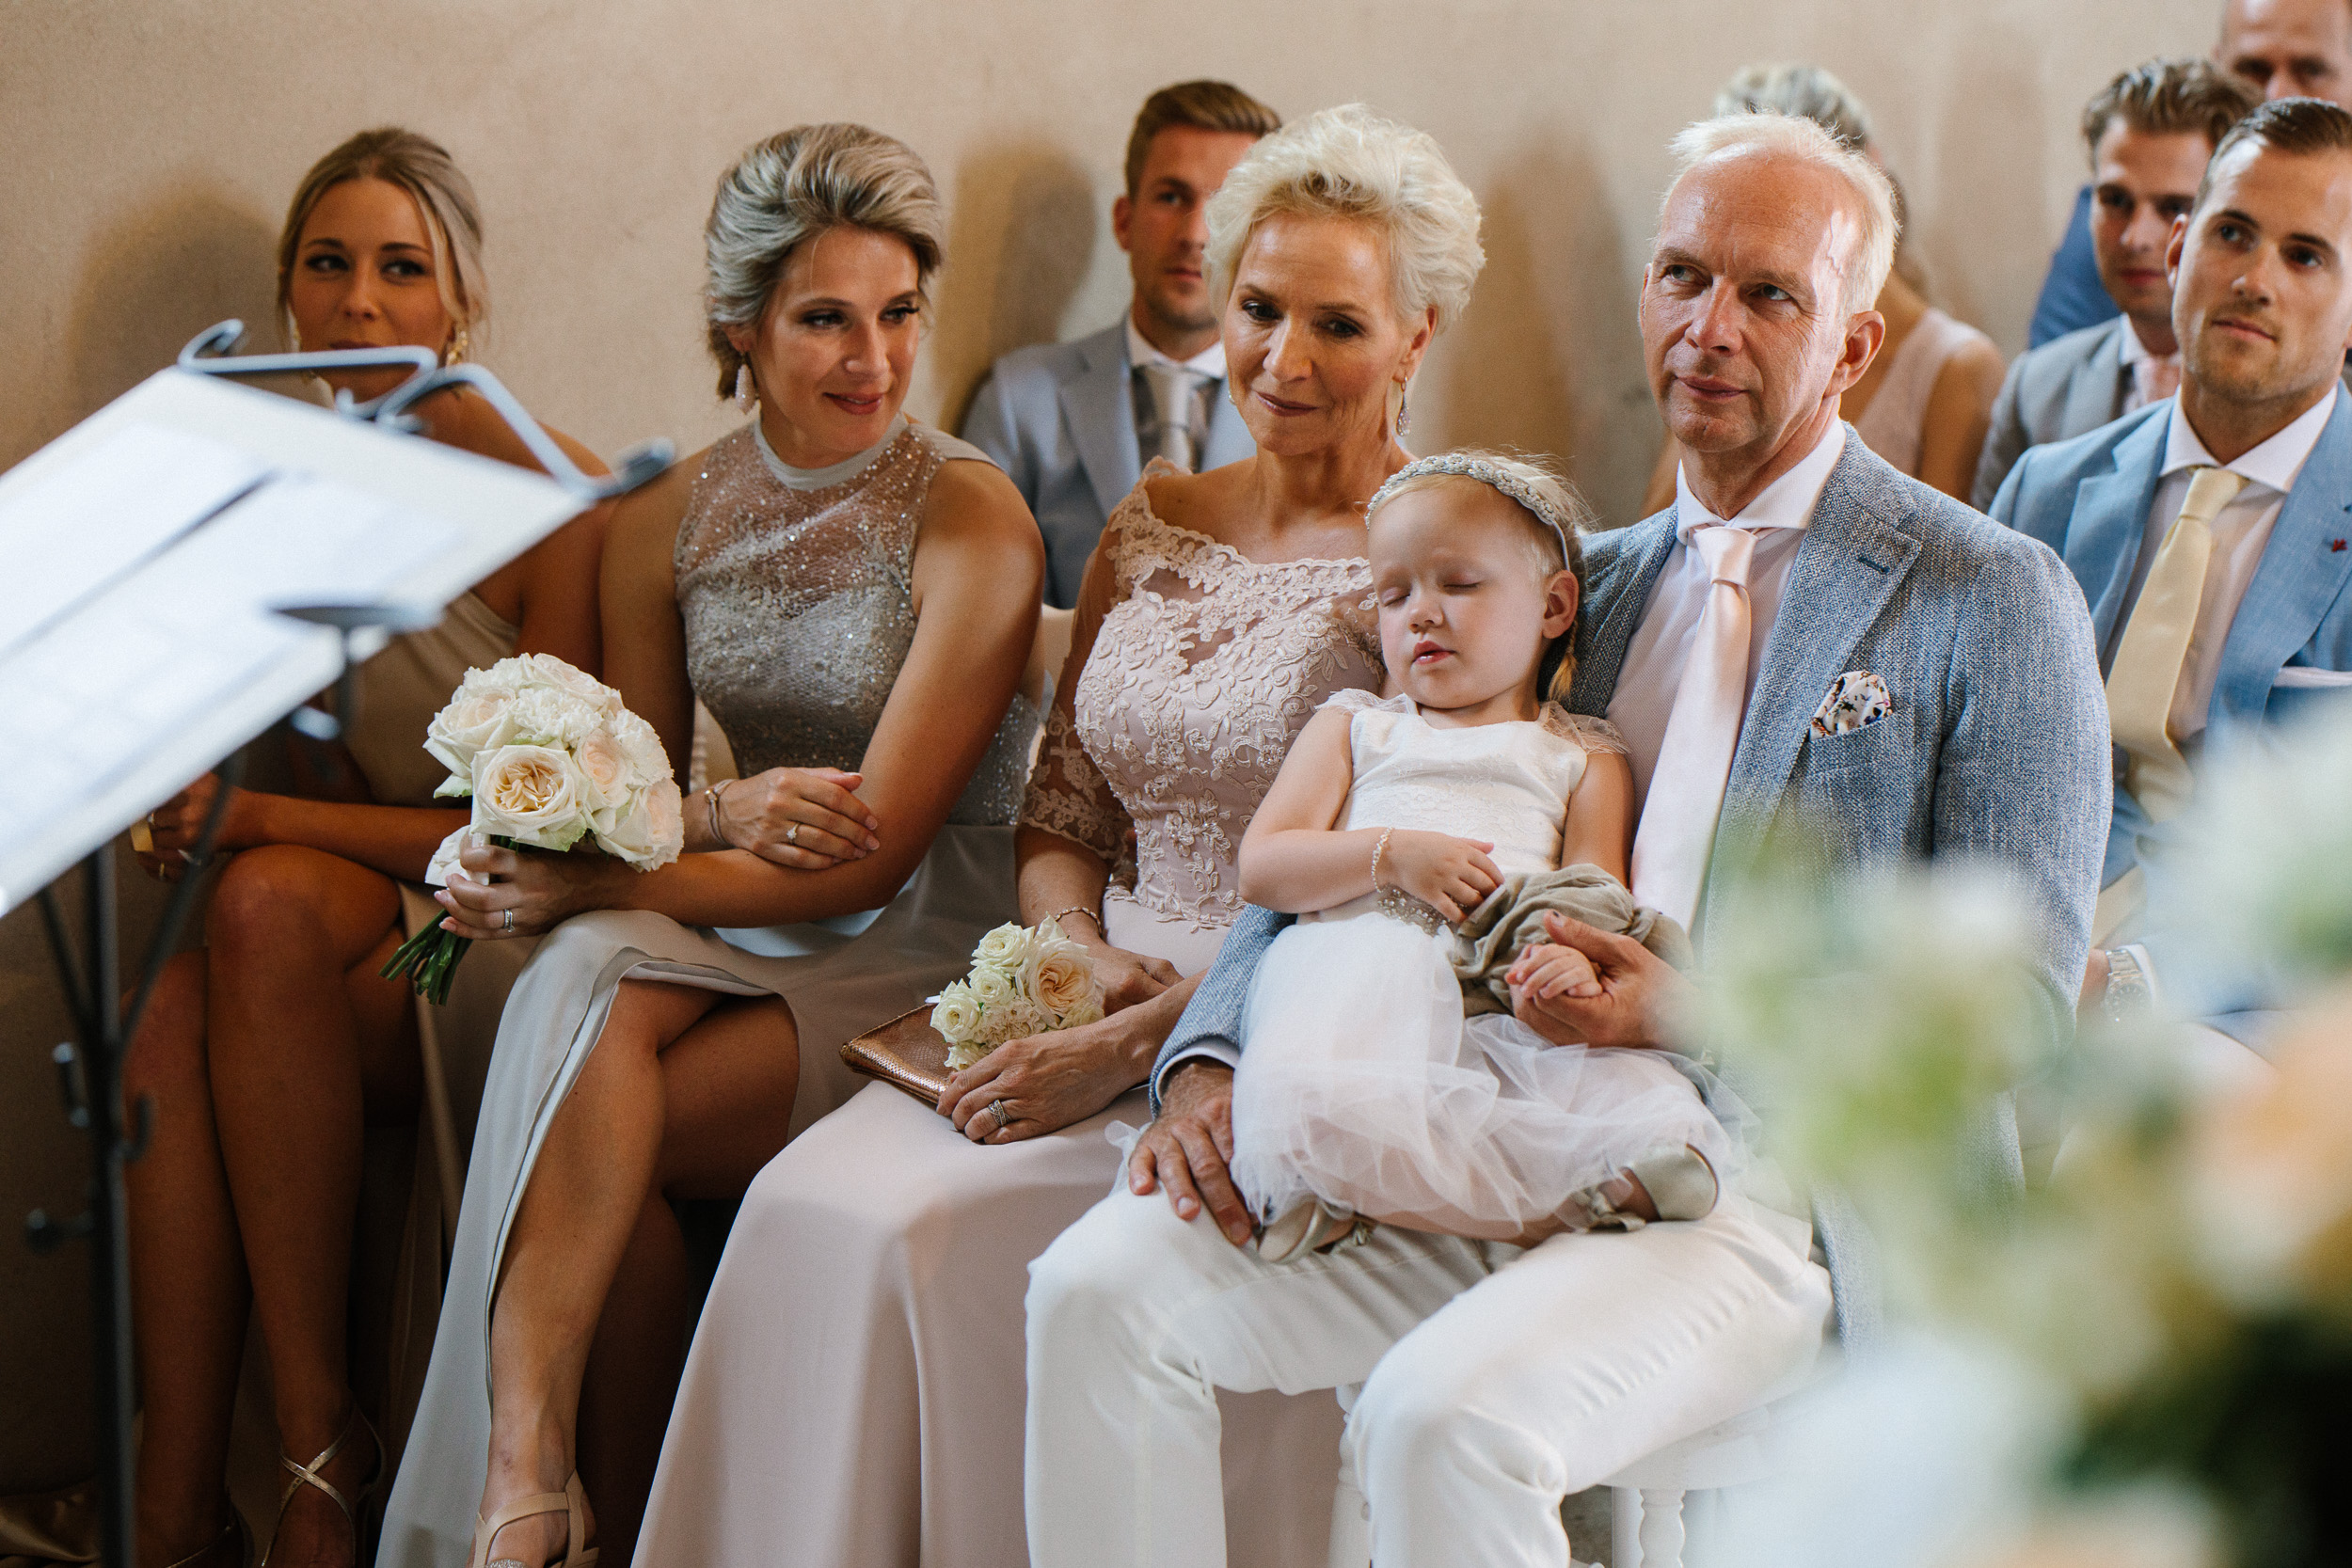 Wedding-Chateau-de-Varennes-048.jpg